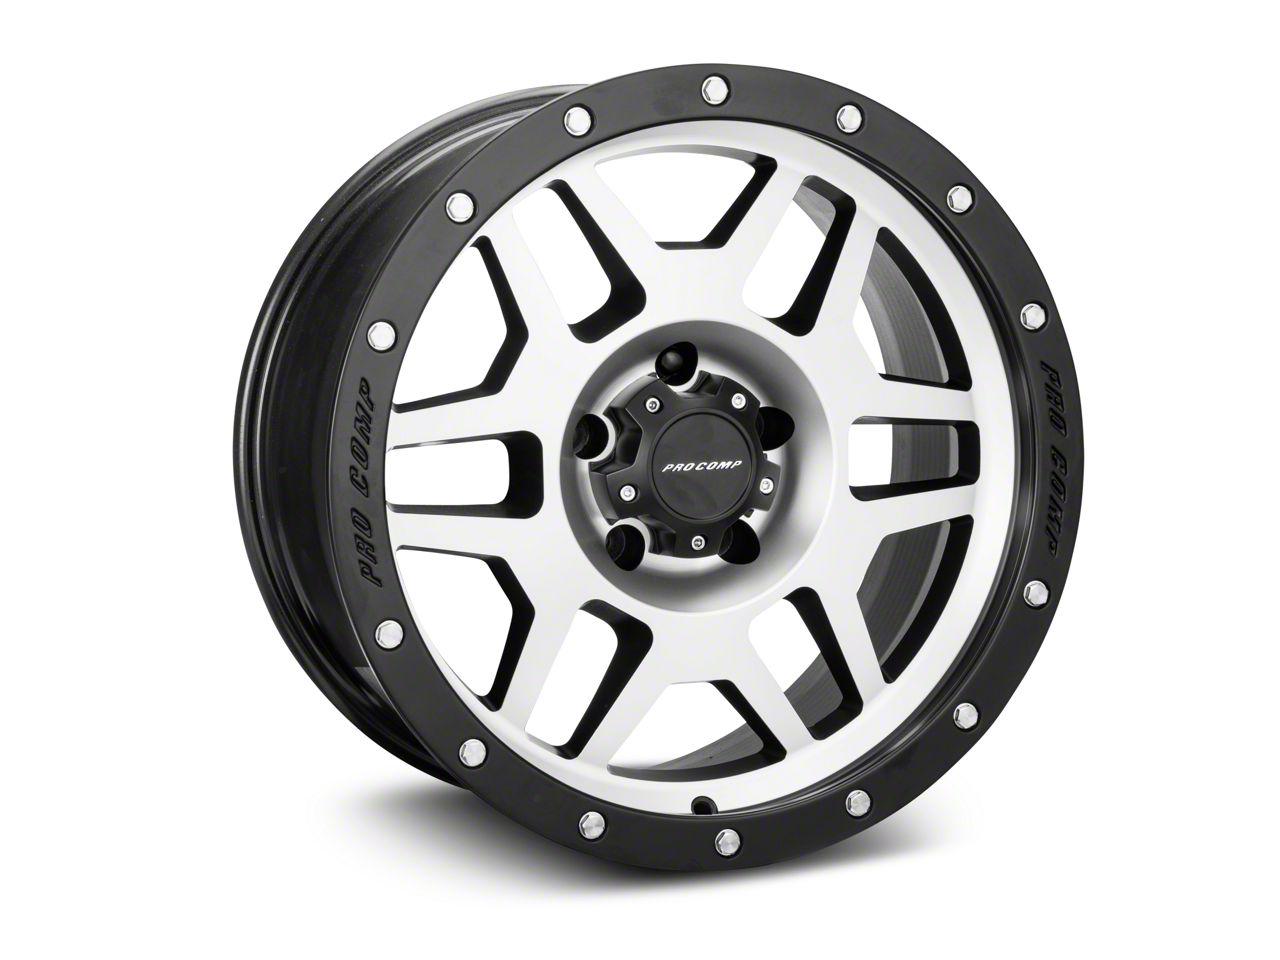 Pro Comp Alloy Series 41 Phaser Black Machined Wheel - 18x9 (07-18 Jeep Wrangler JK)